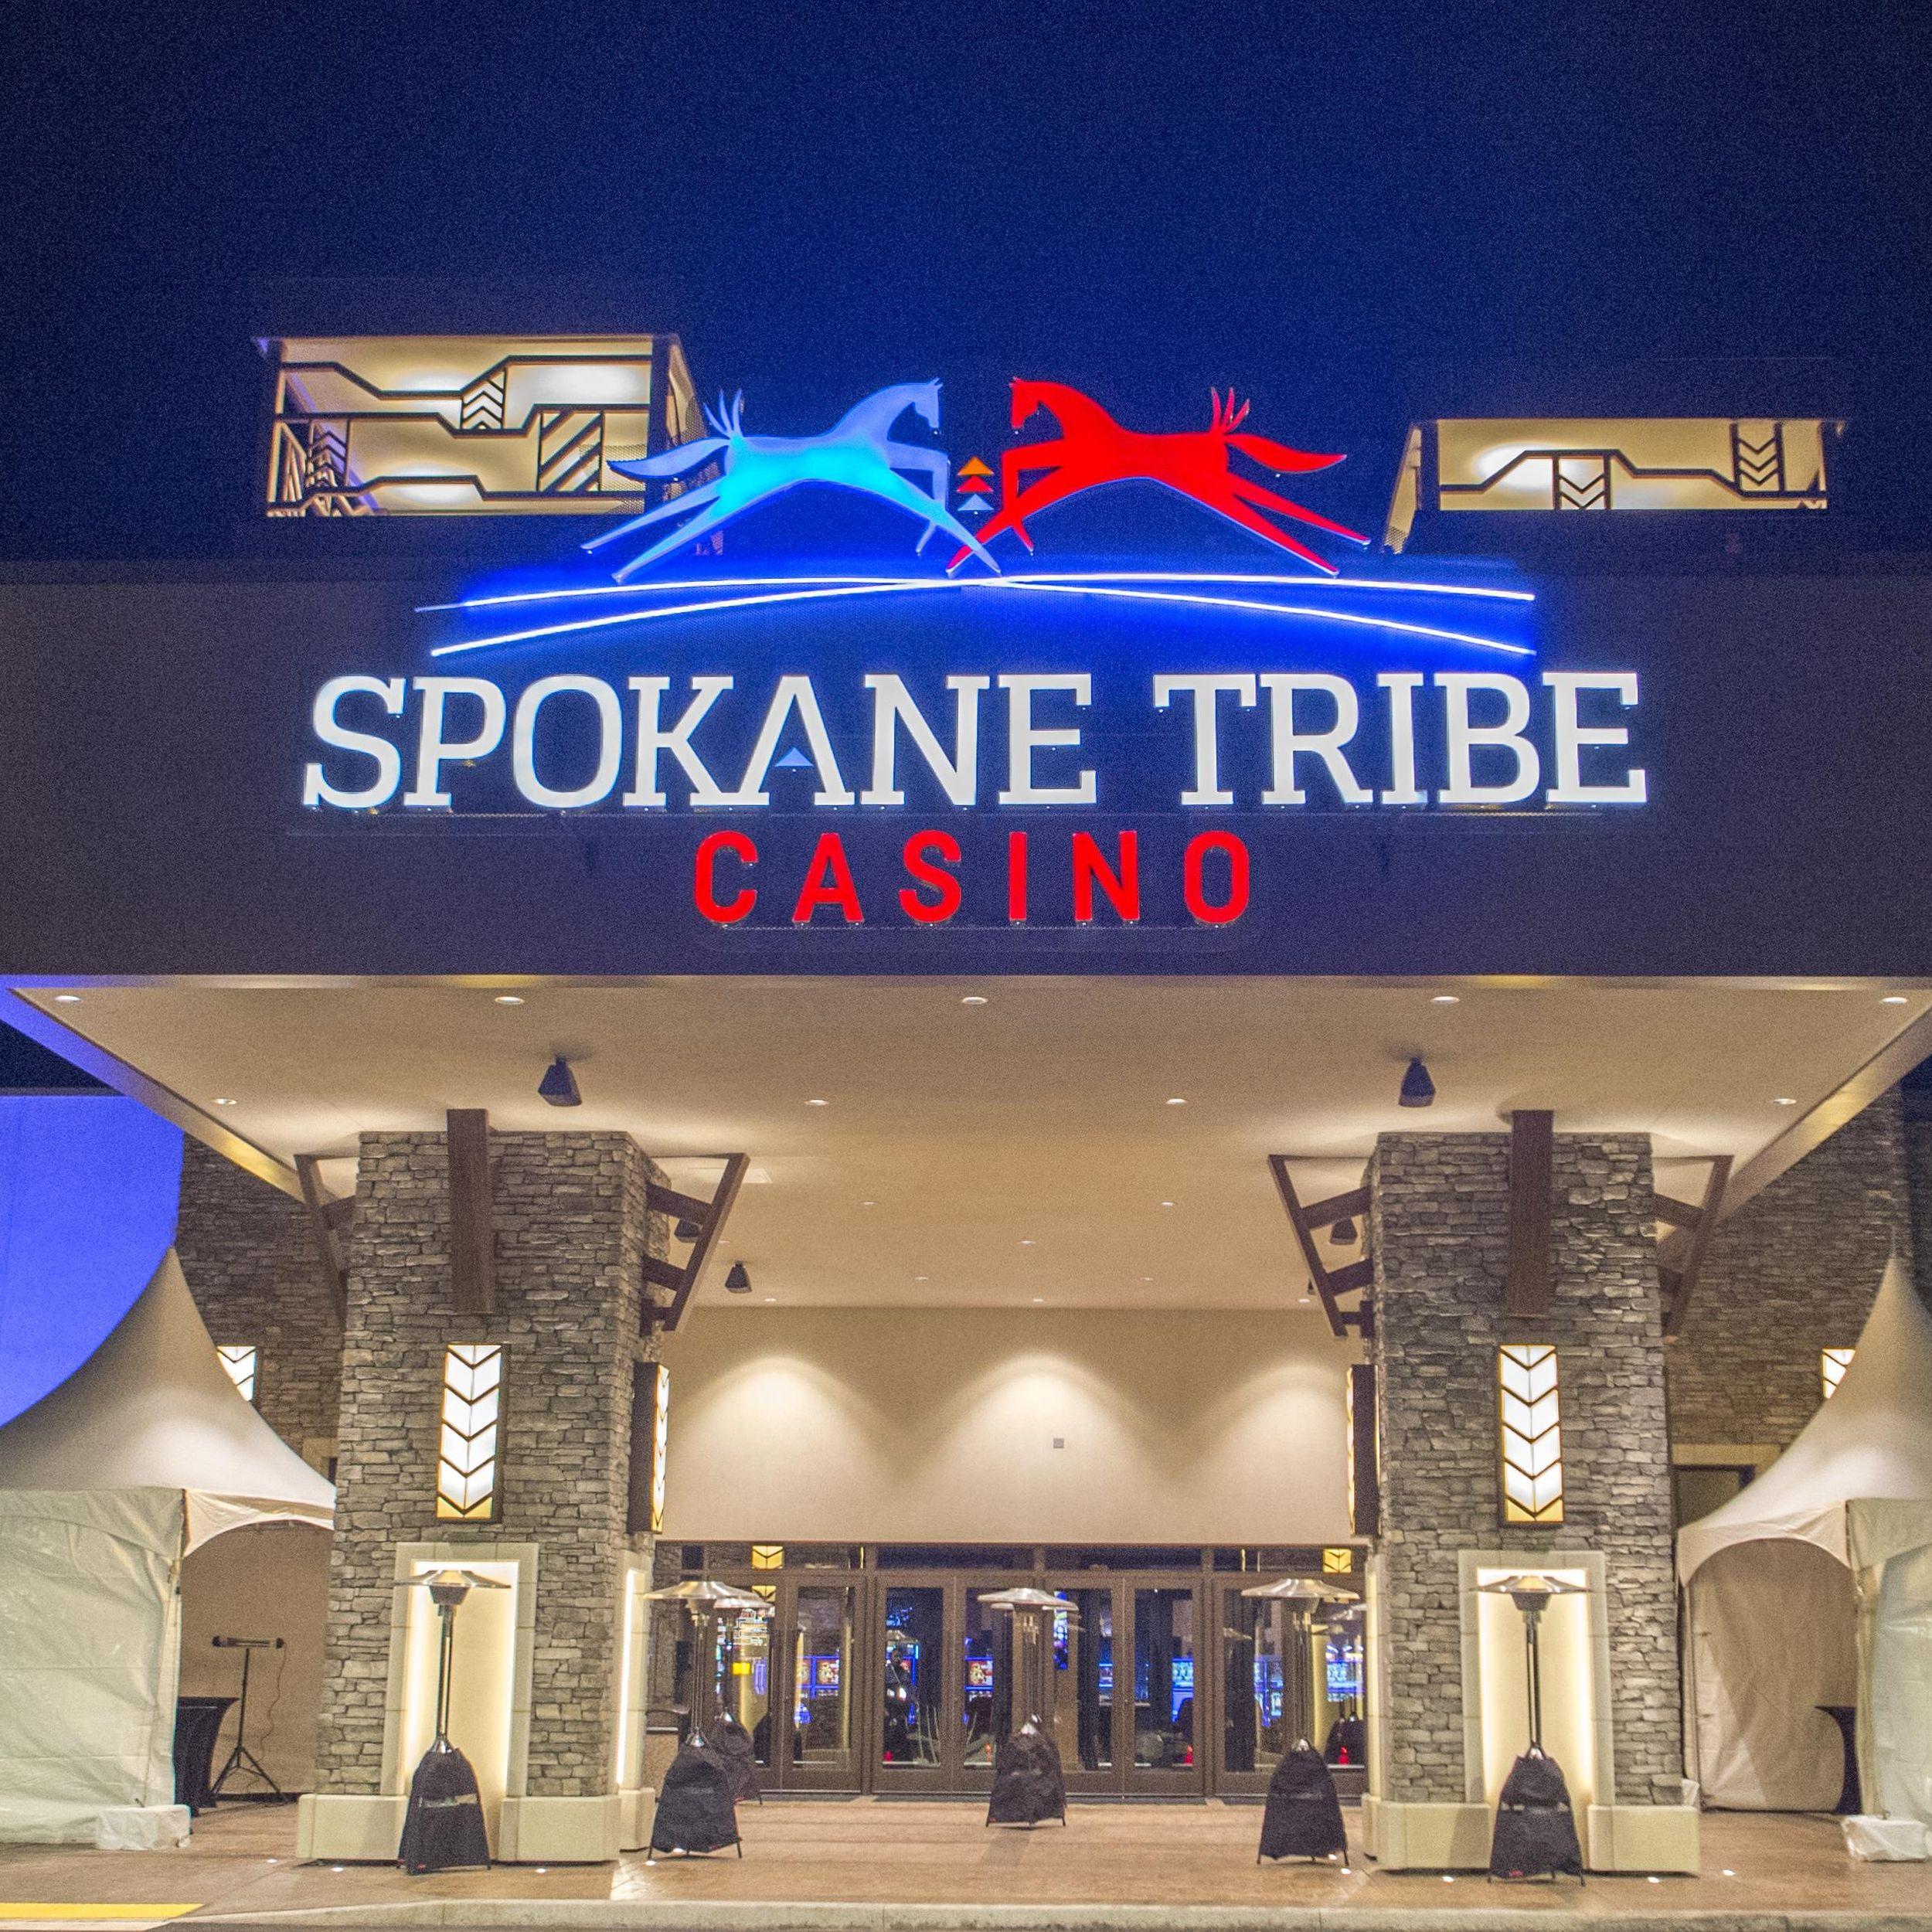 Casino in spokane washington problem gambling in washington state